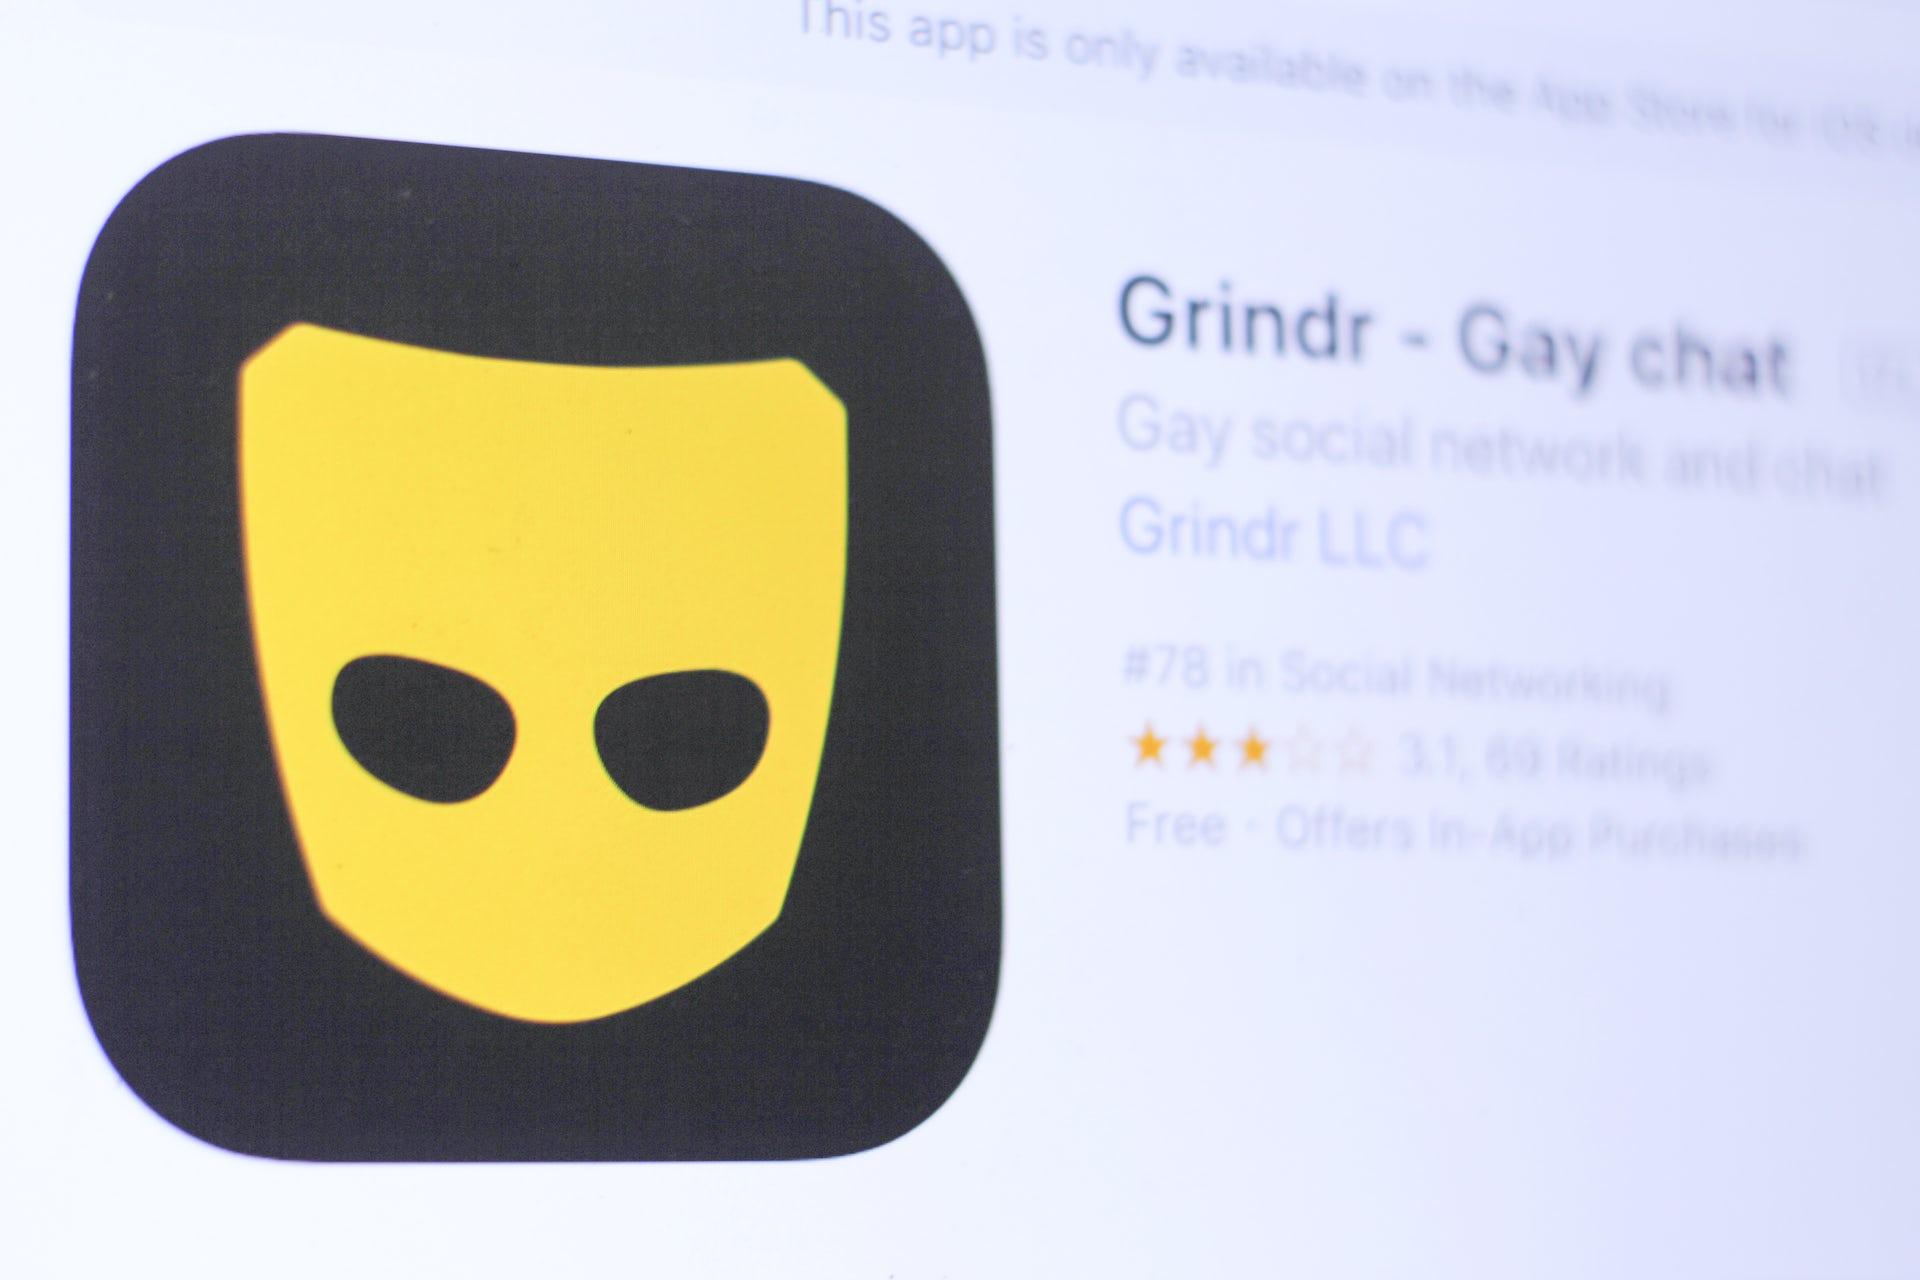 Grindr app not working